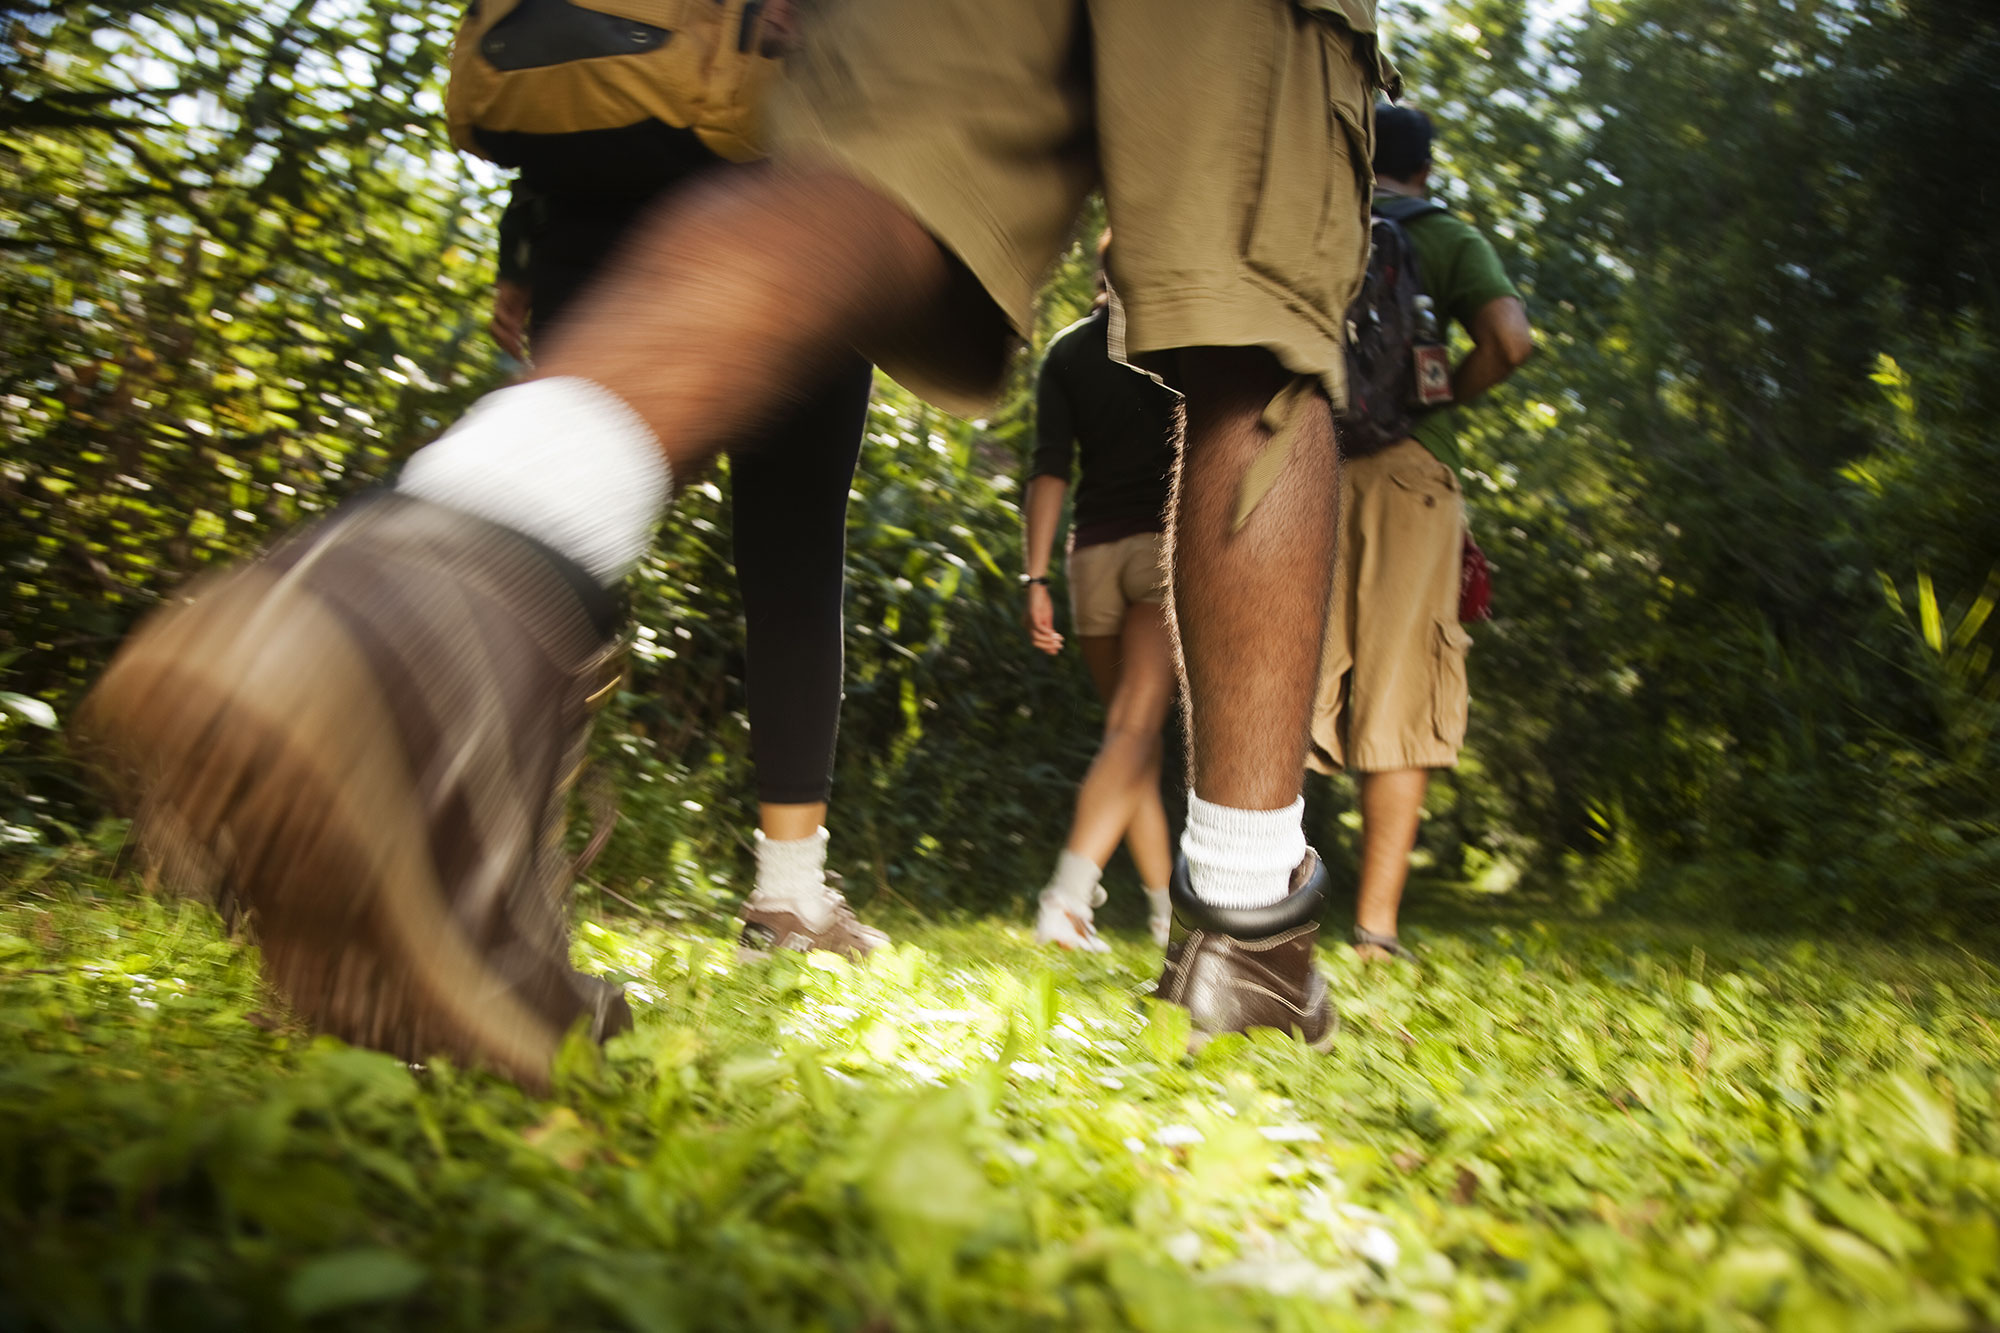 020-LIFE_hiking-0066-copy.jpg